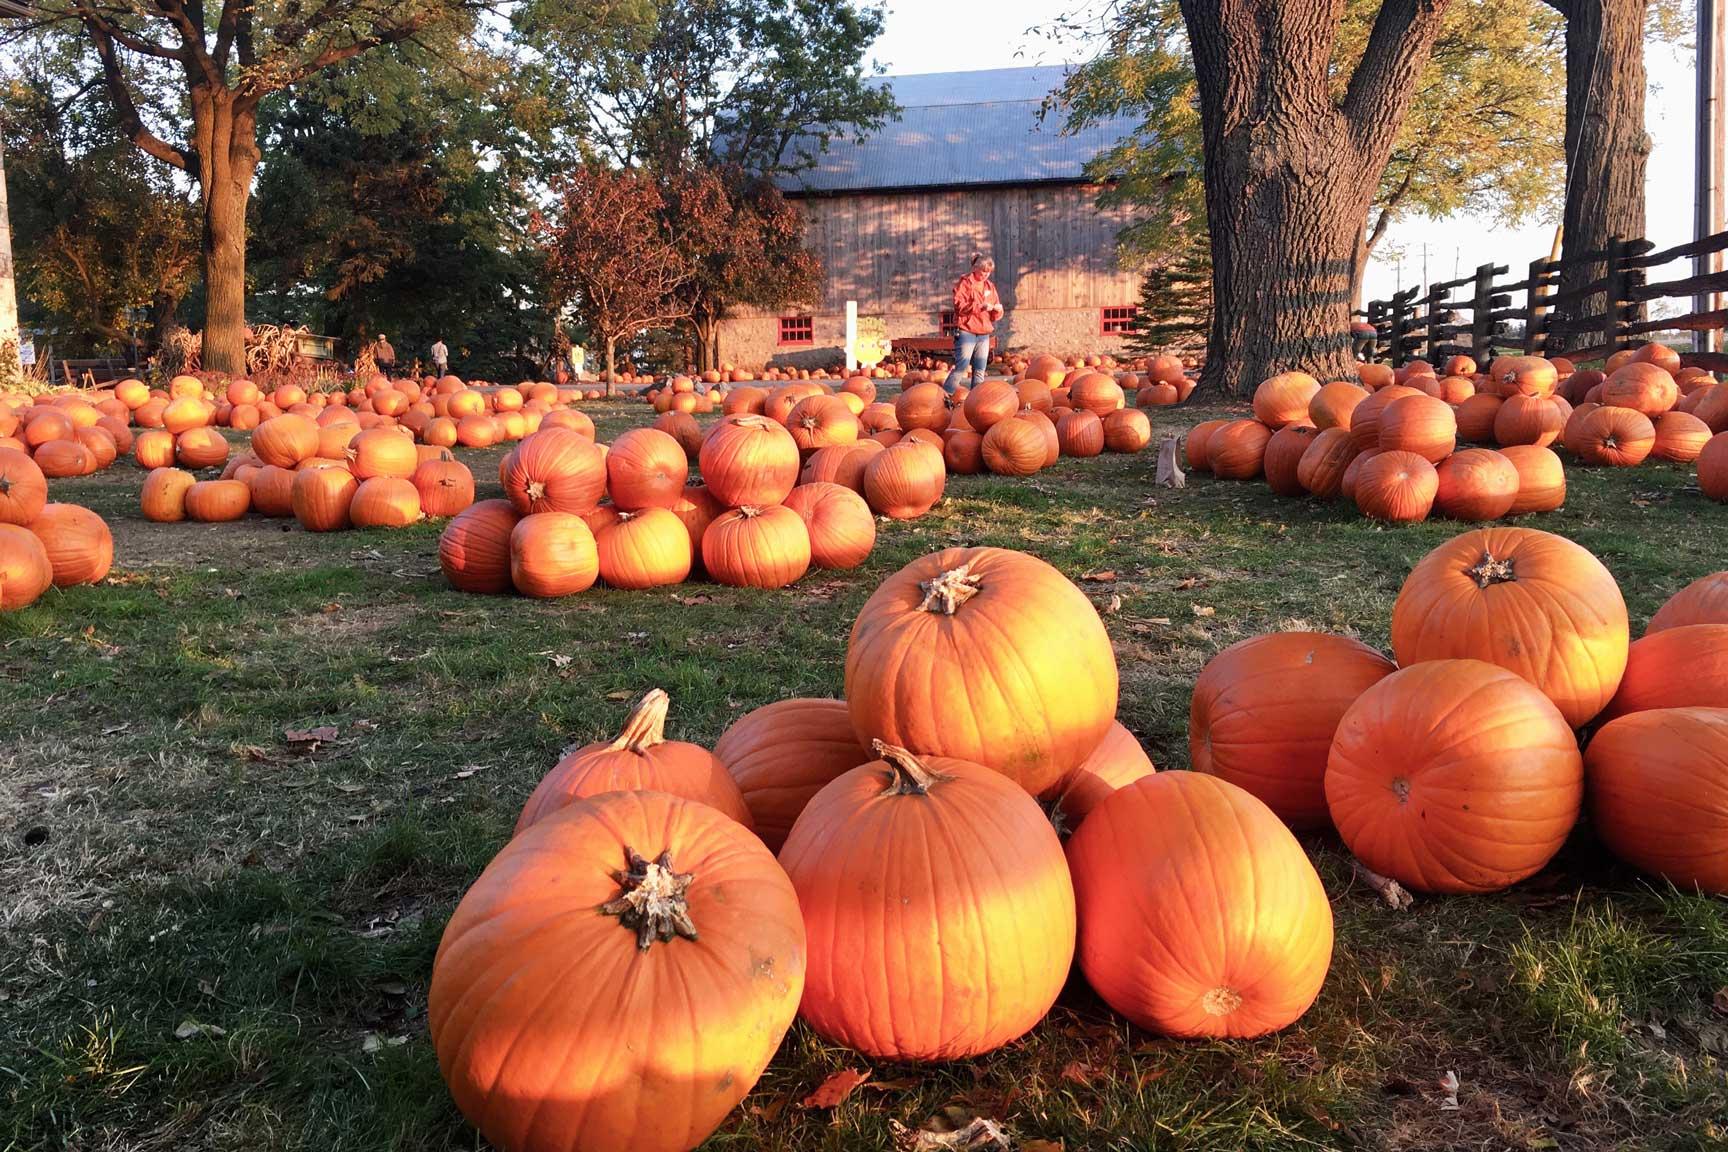 Strom's Pumpkins